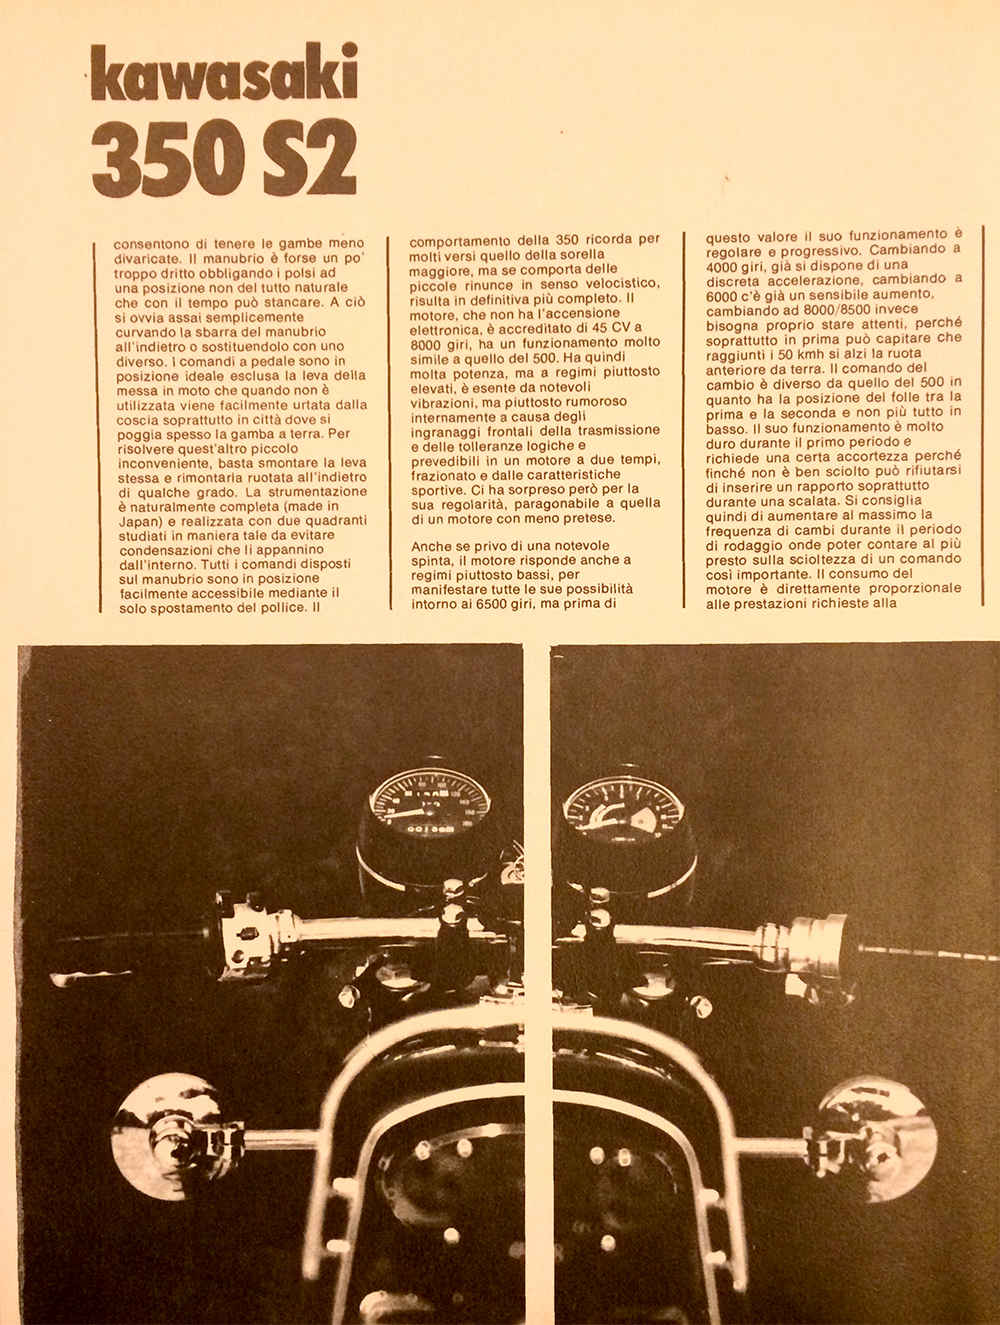 1971 Kawasaki 350 S2 Italy road test 08.jpg